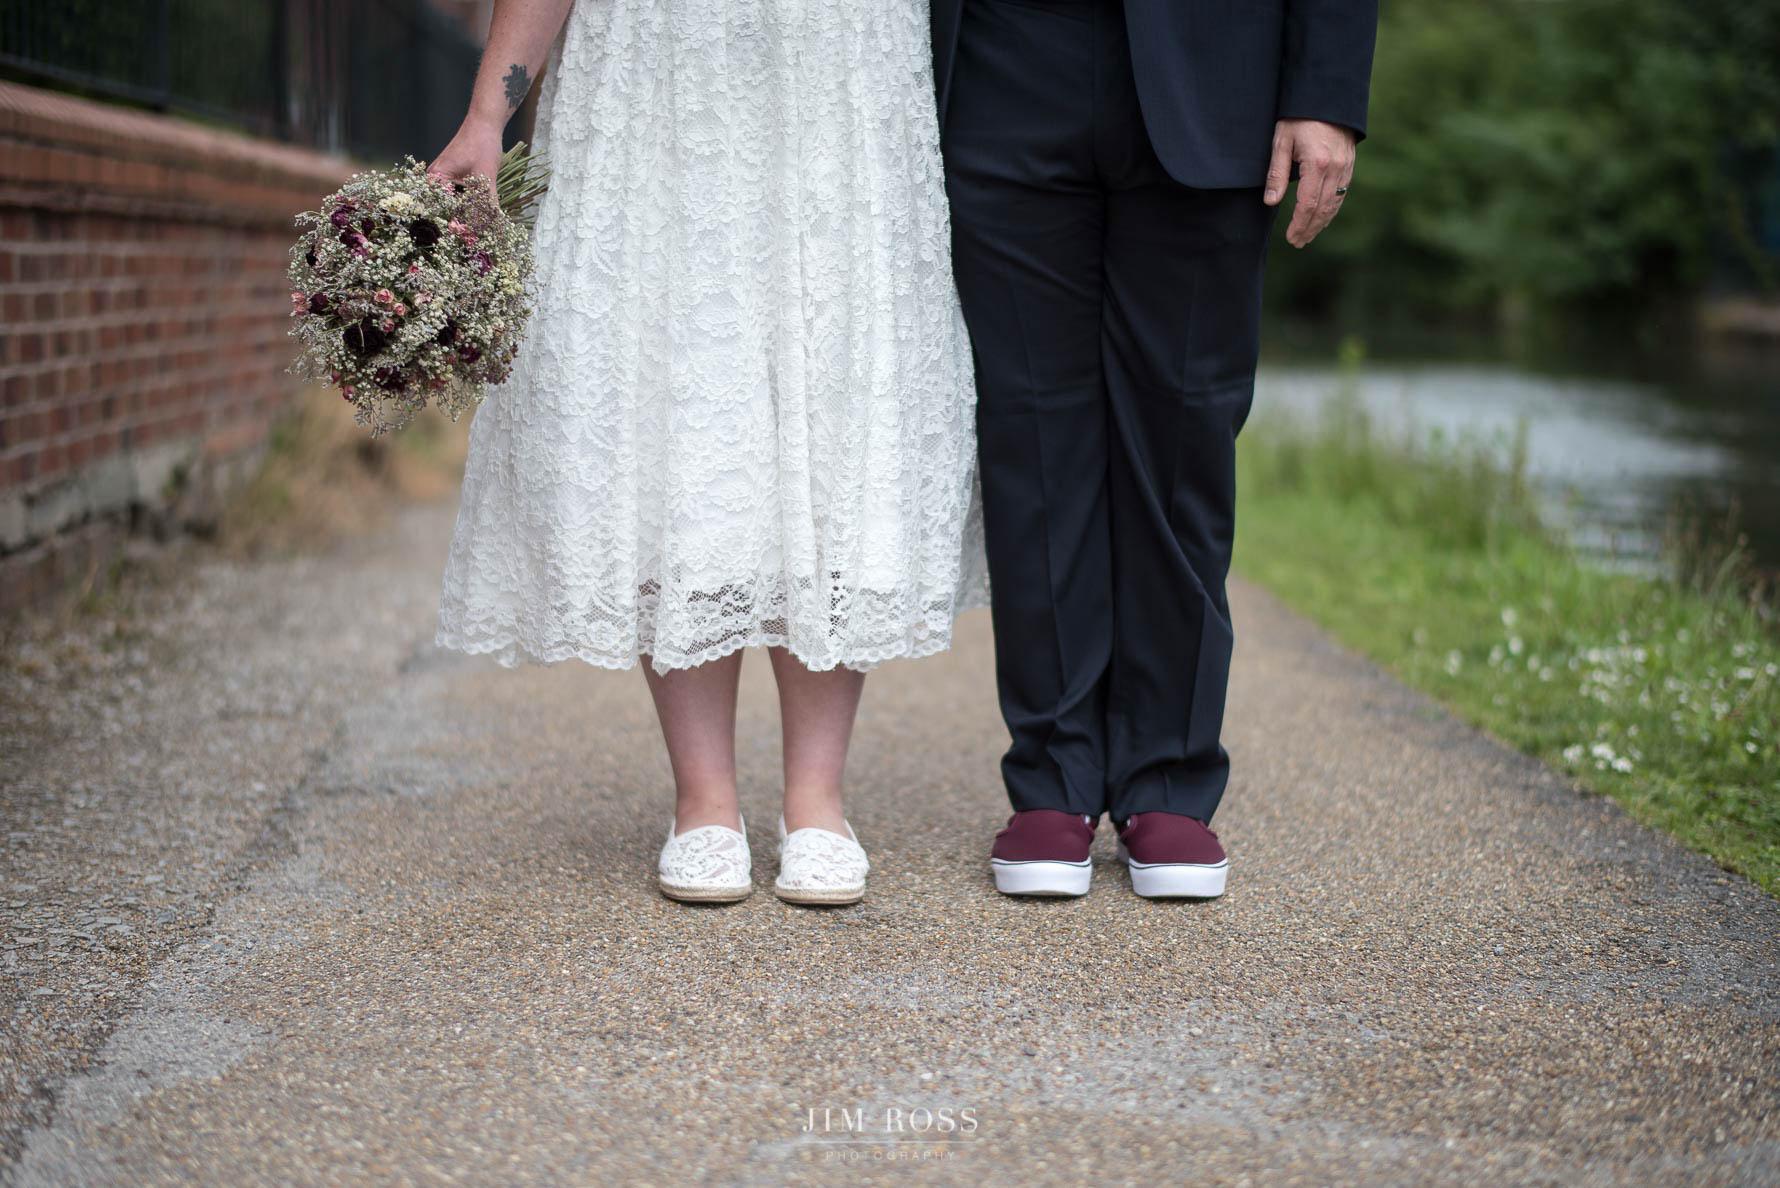 Alternative couple wedding shoes